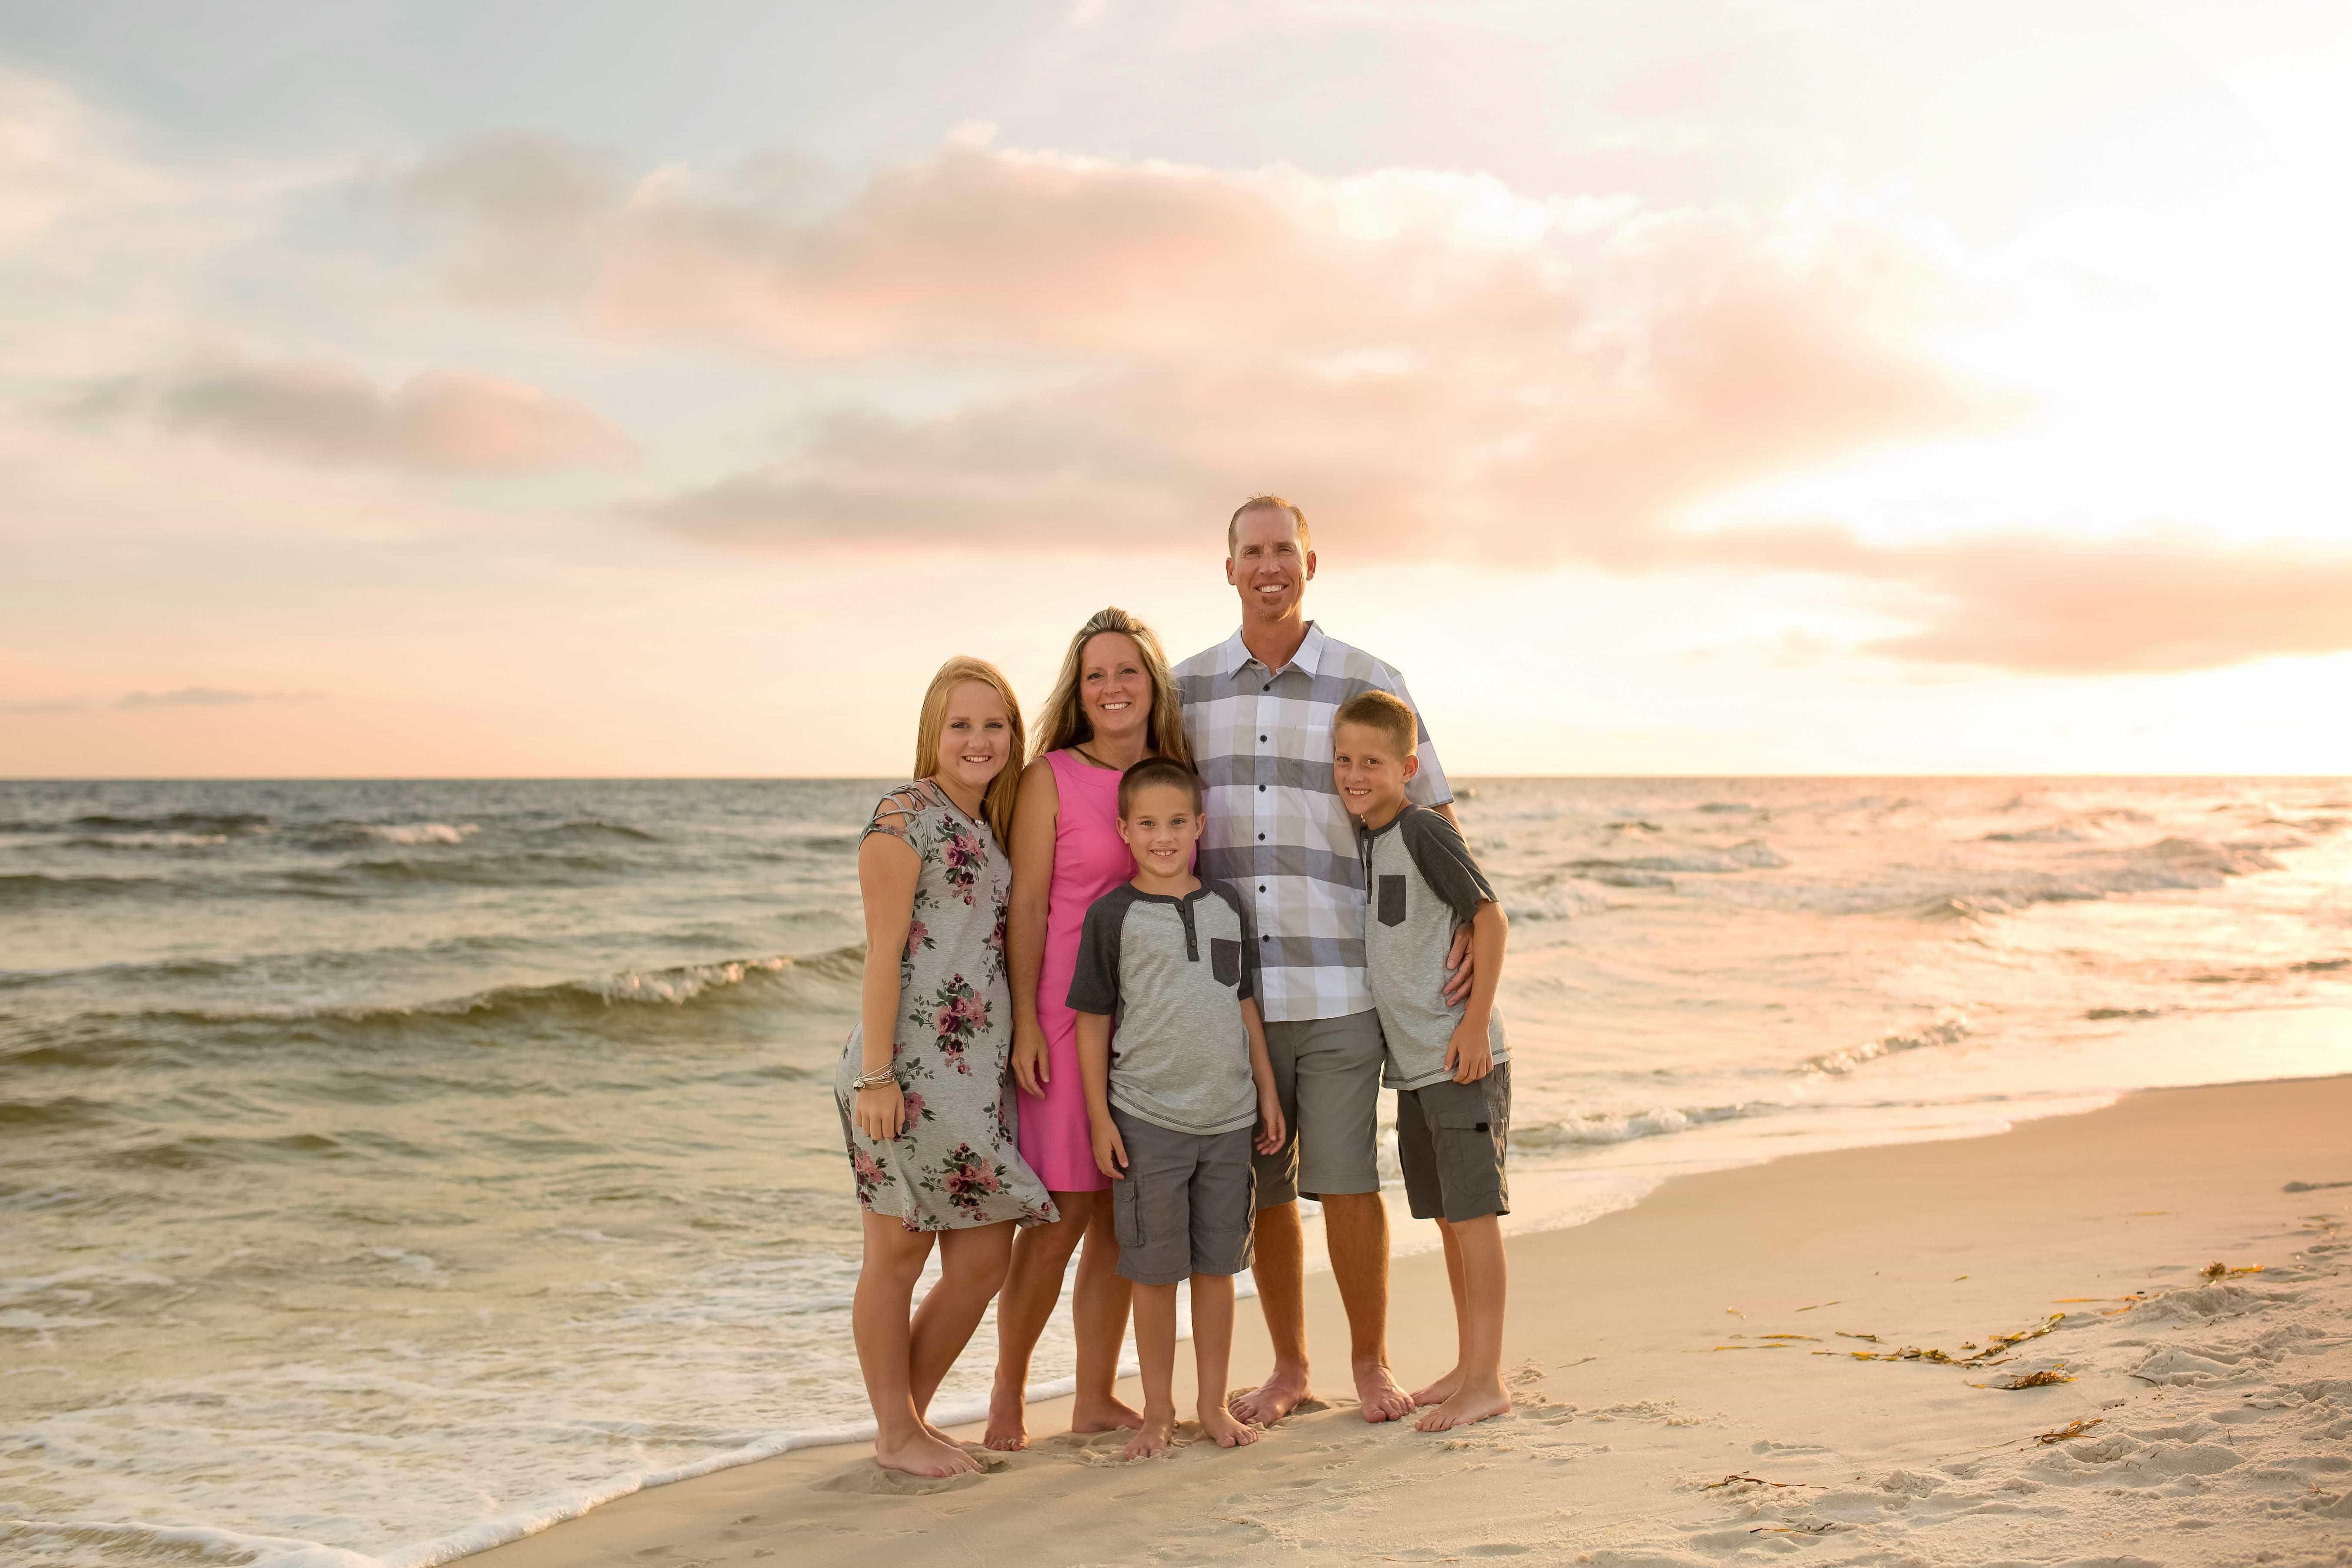 Sunset Family Photos in Panama City Beach - LJennings